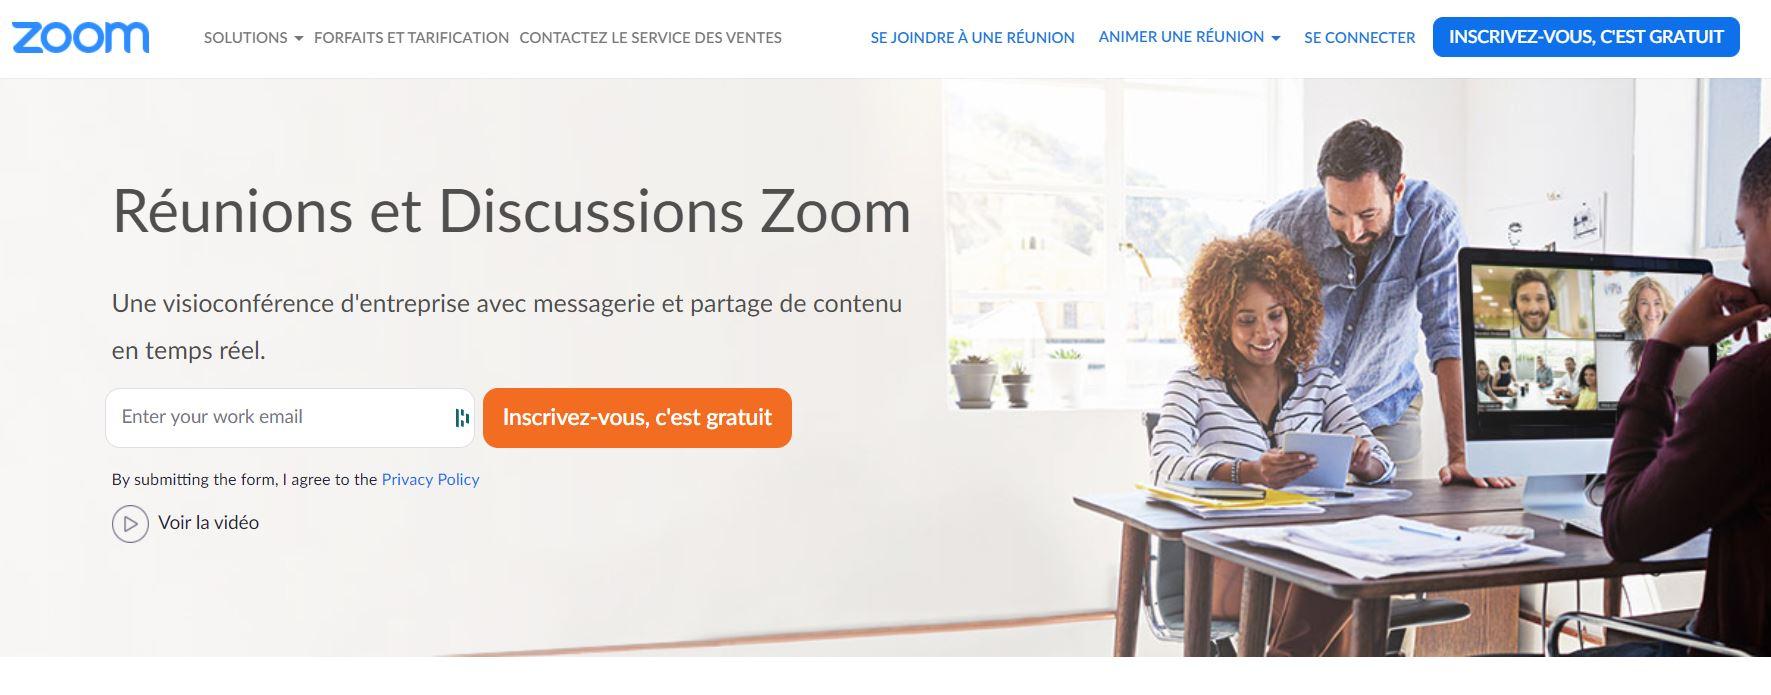 zoom application télétravail